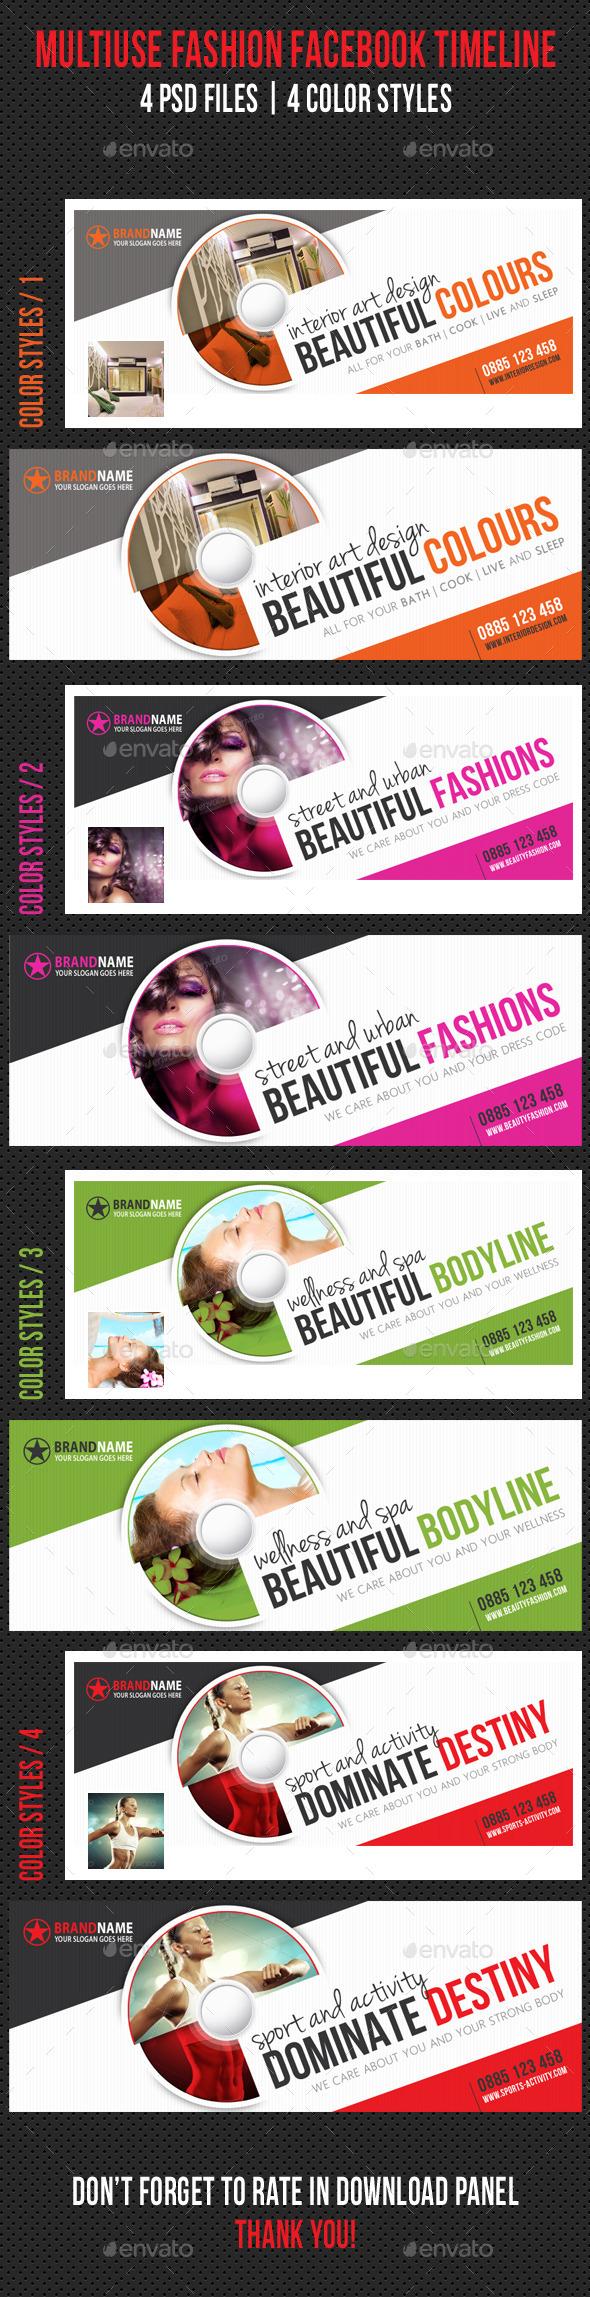 Multiuse Fashion Facebook Timeline - Facebook Timeline Covers Social Media